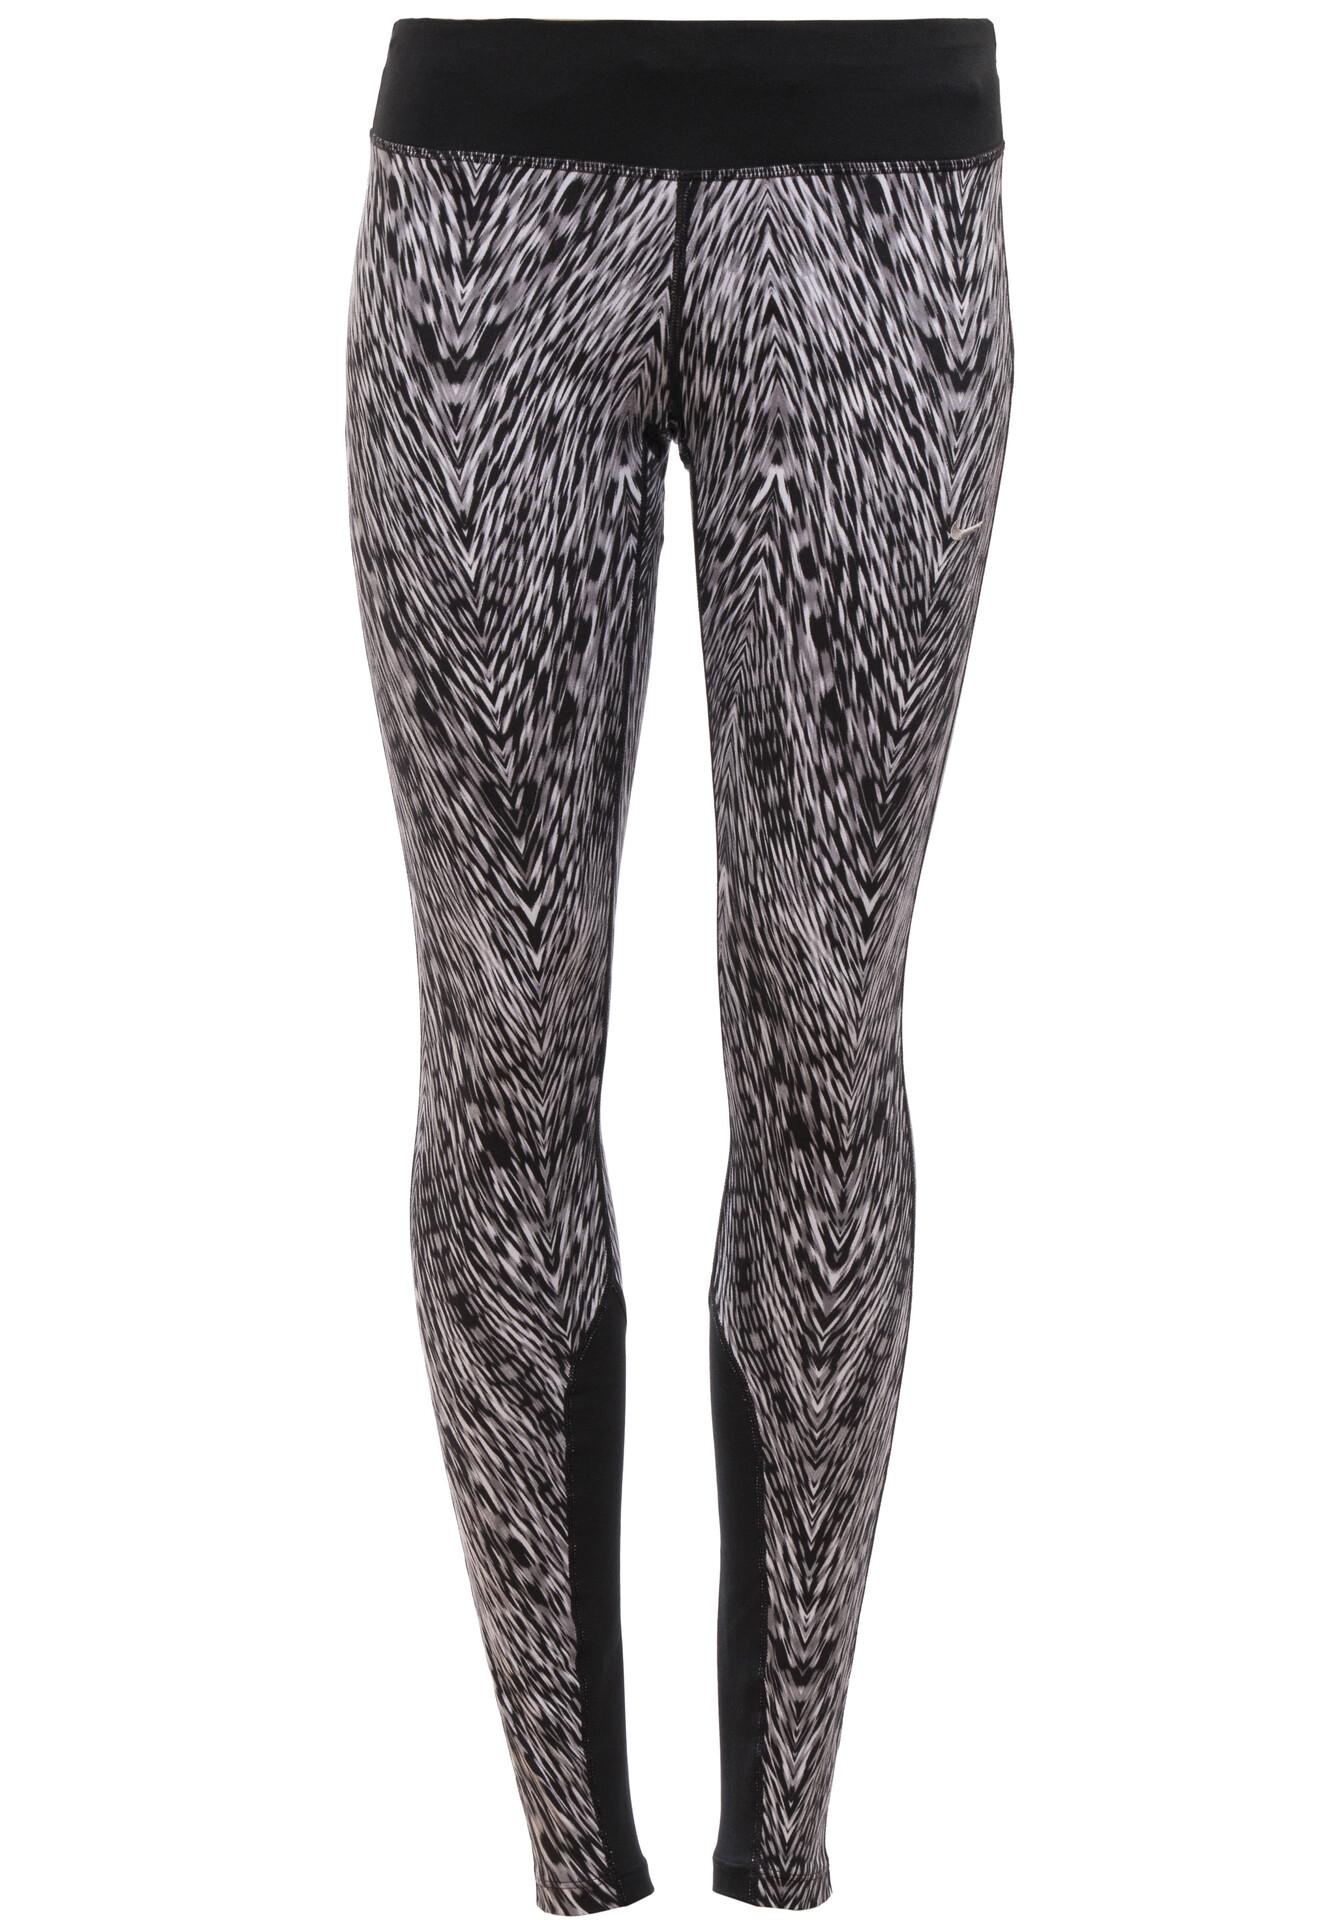 Mujer Nike Pantalones Epic Running Largos es Blanconegro Campz OIIaFqWr